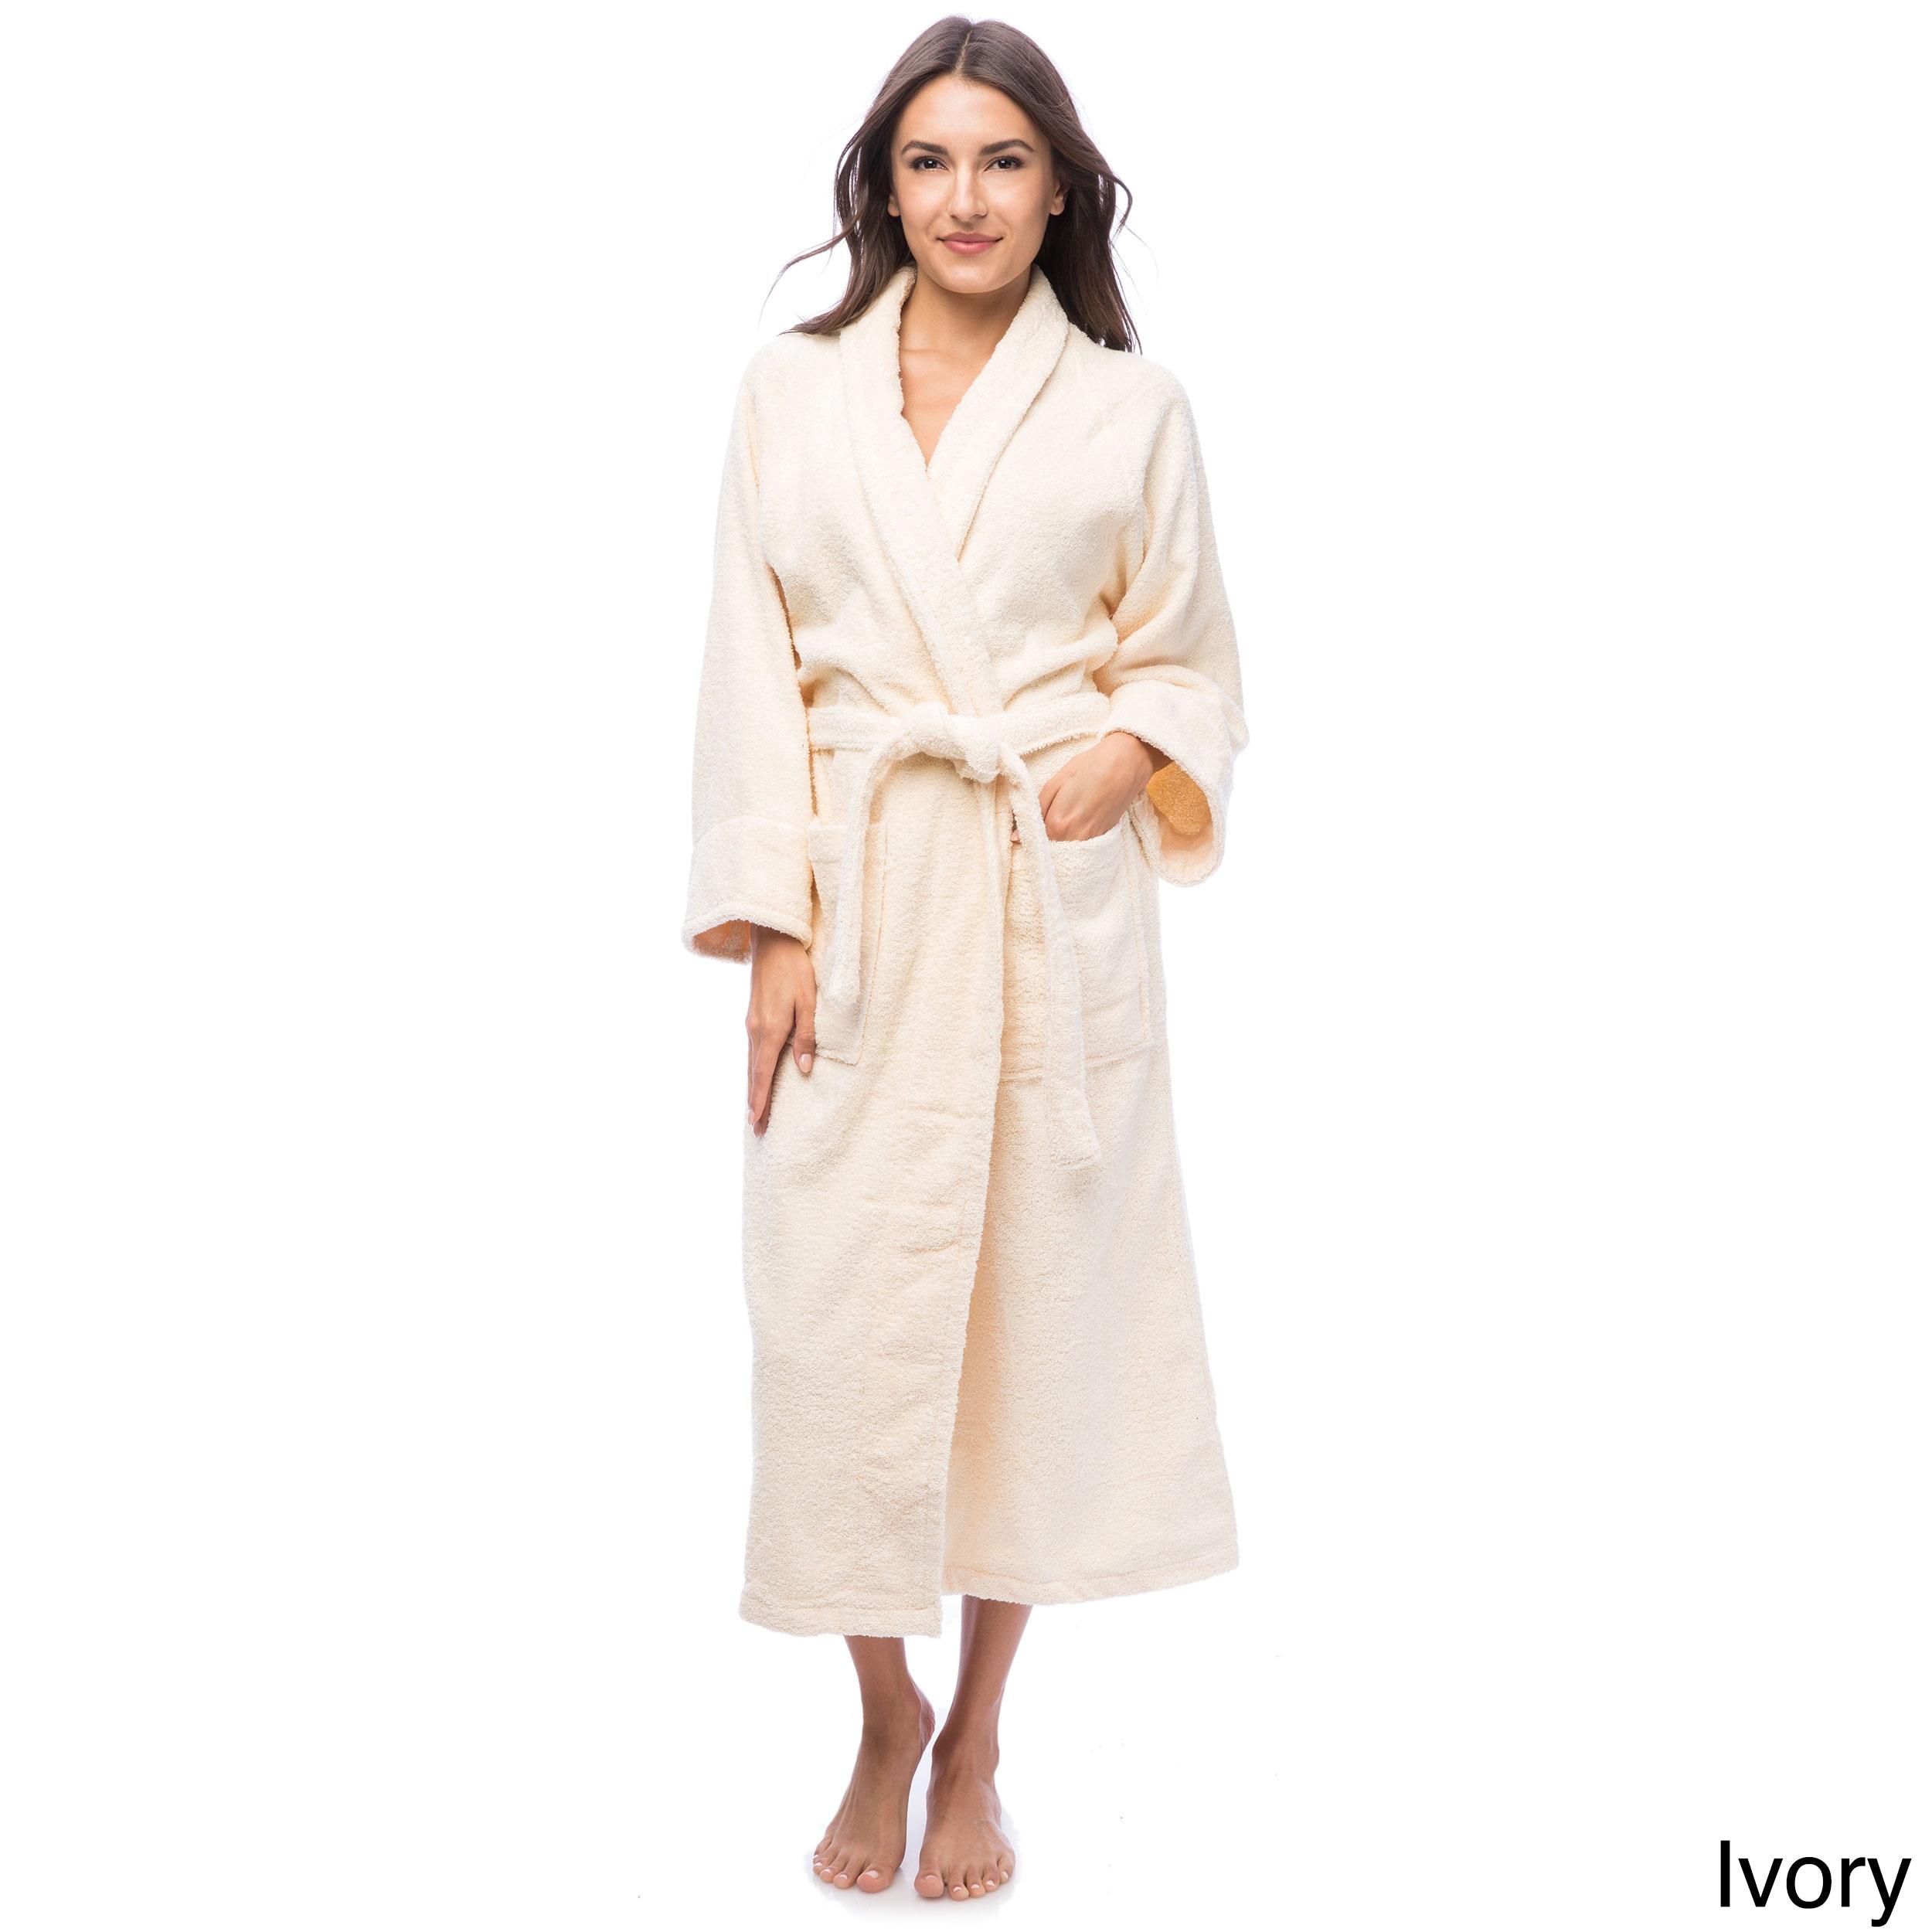 Superior Luxurious 100-percent Combed Cotton Unisex Terry...